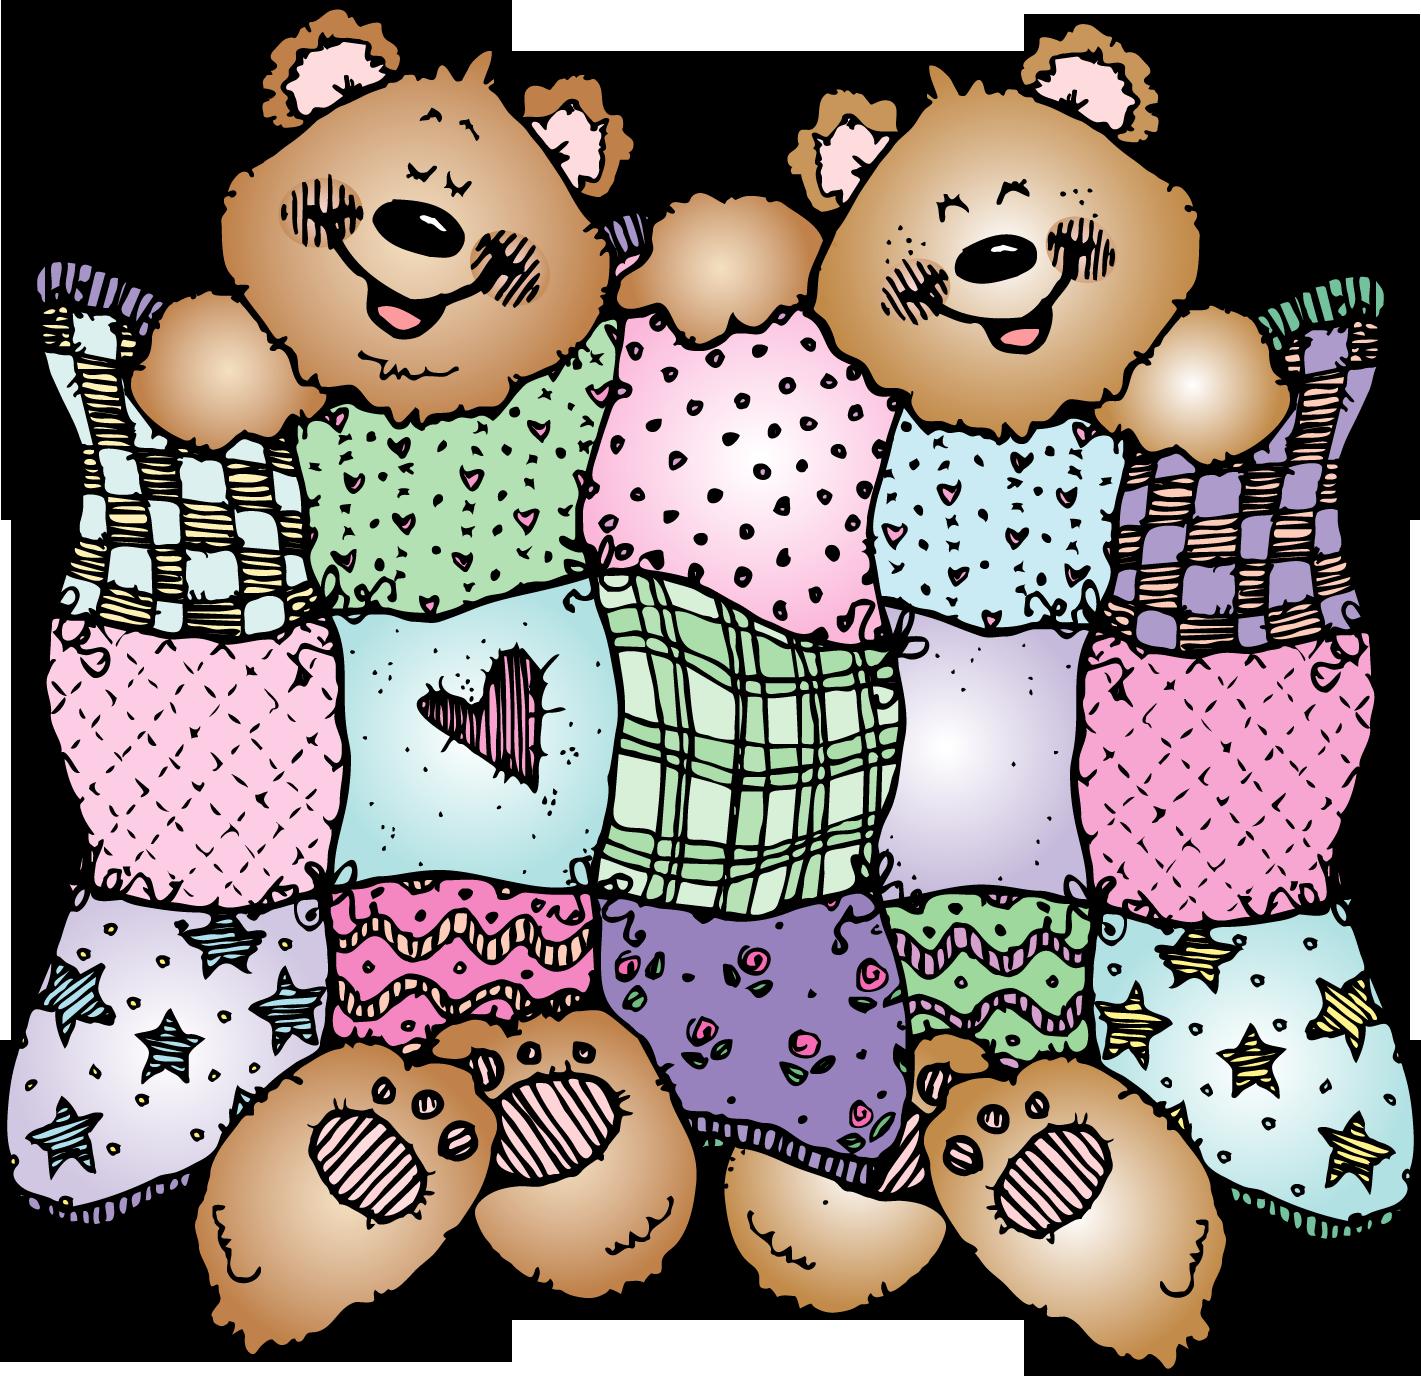 Slumber Party Clip Art Free - ClipArt Best